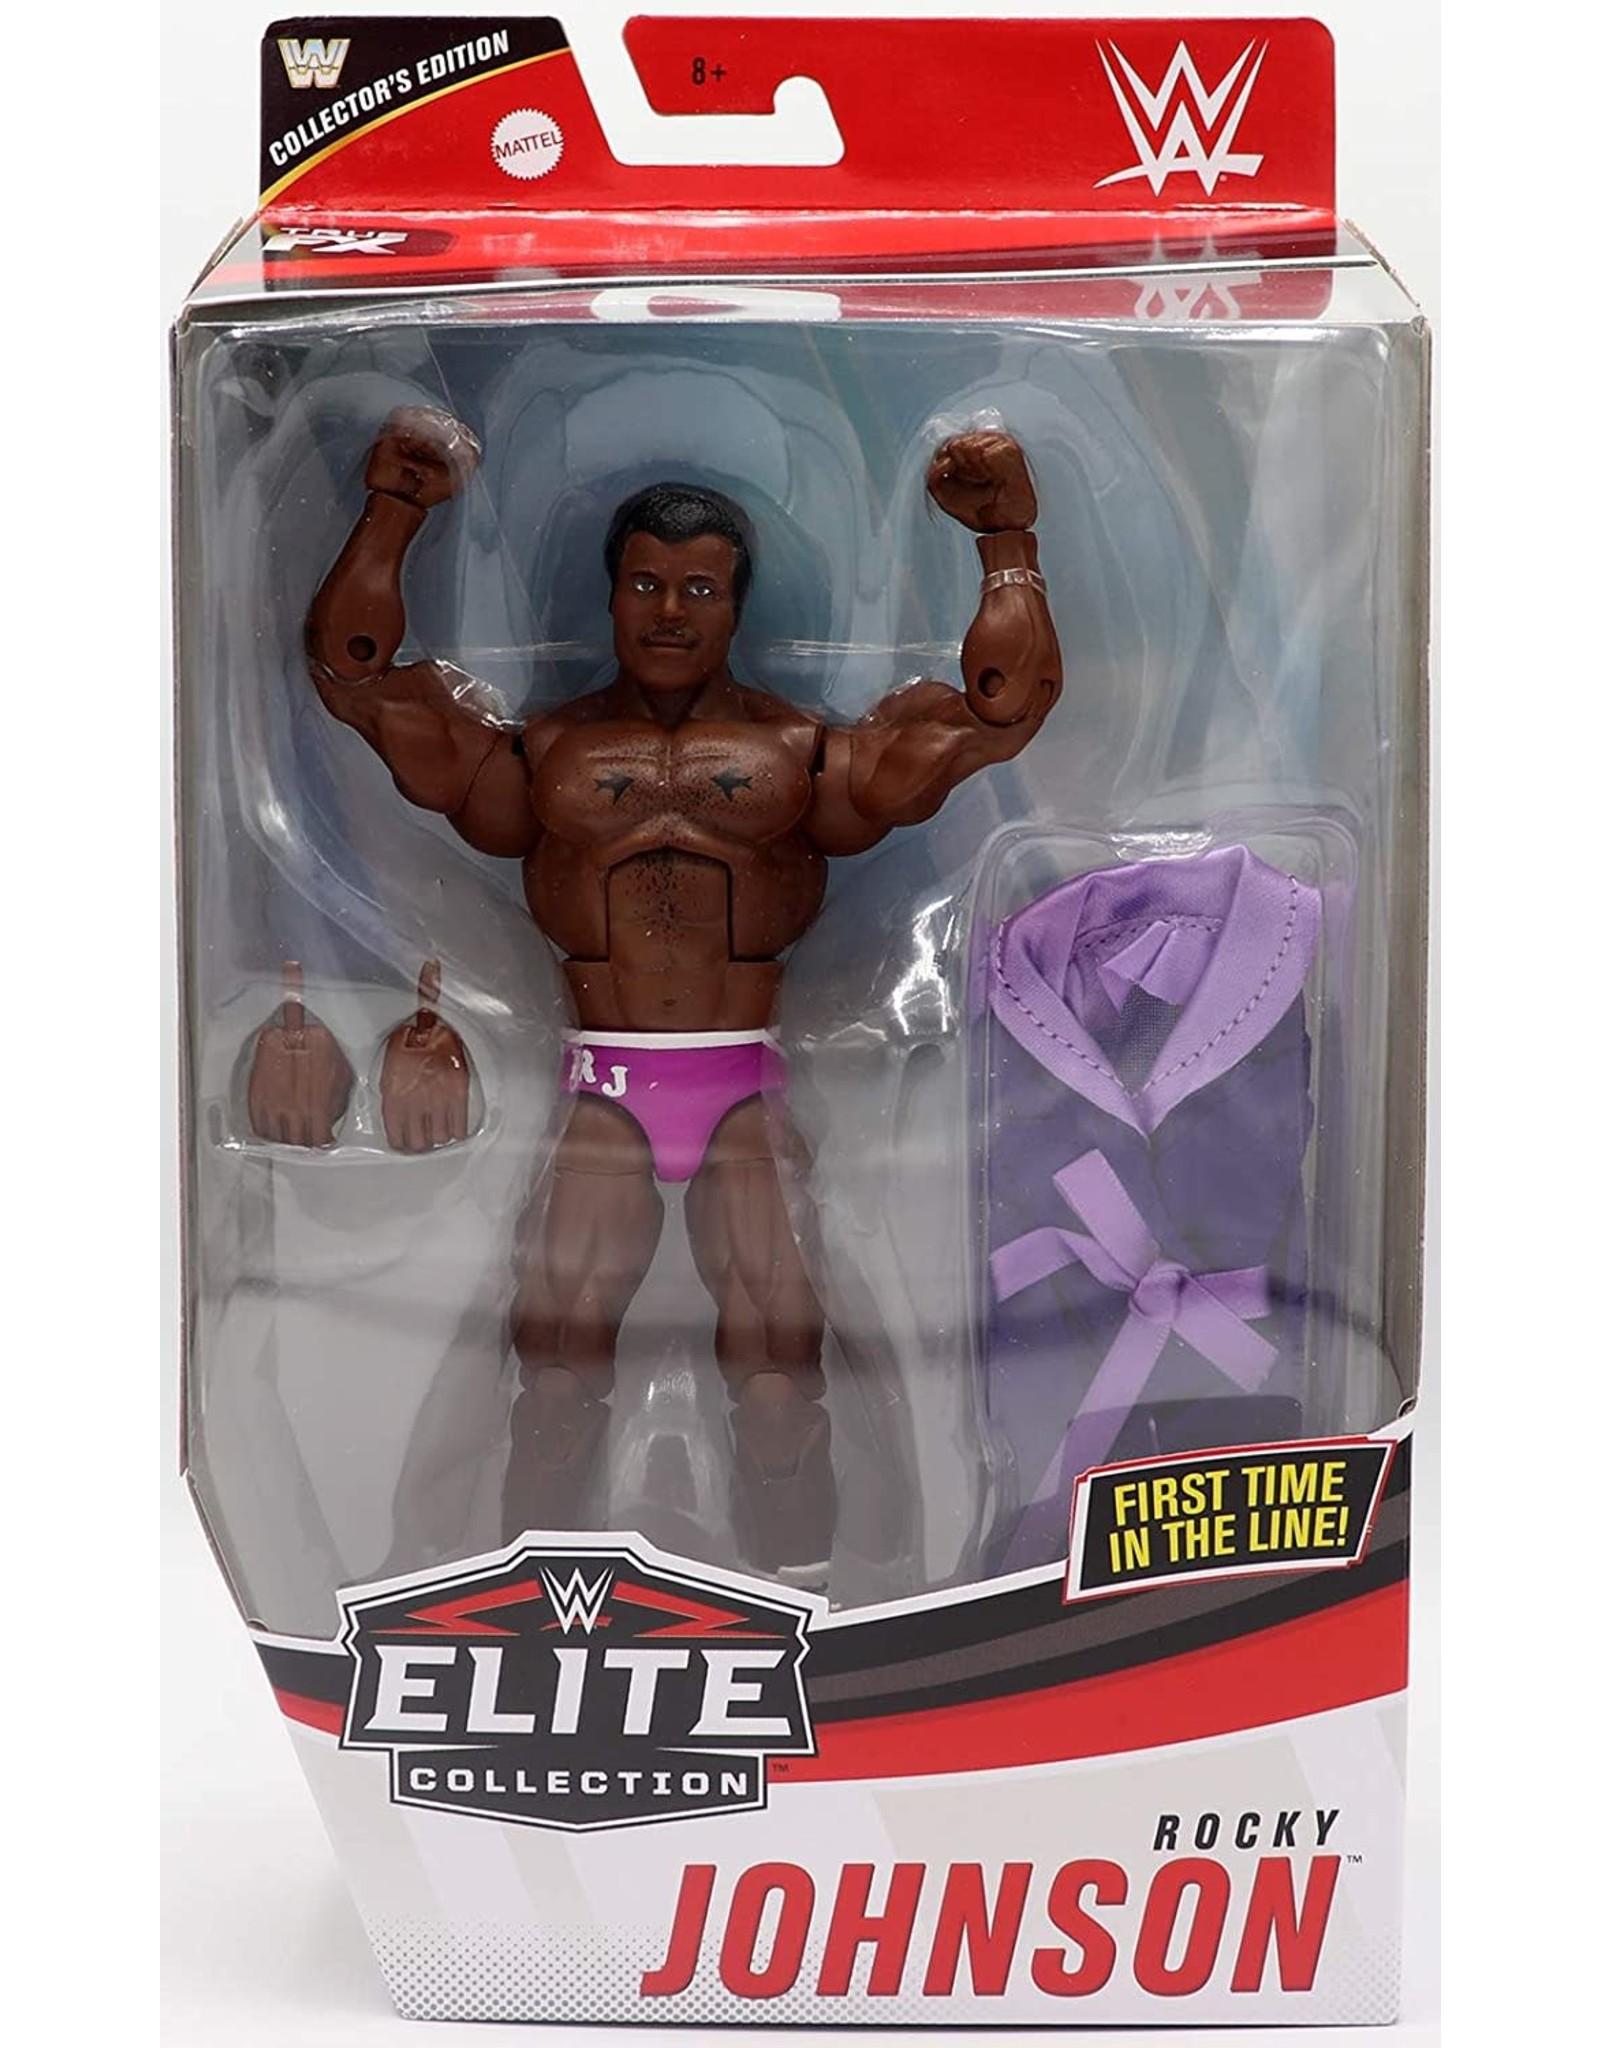 Rocky Johnson Wwe Elite 80 Exclusive Mattel Wrestling Action Figure Big Bang Toys